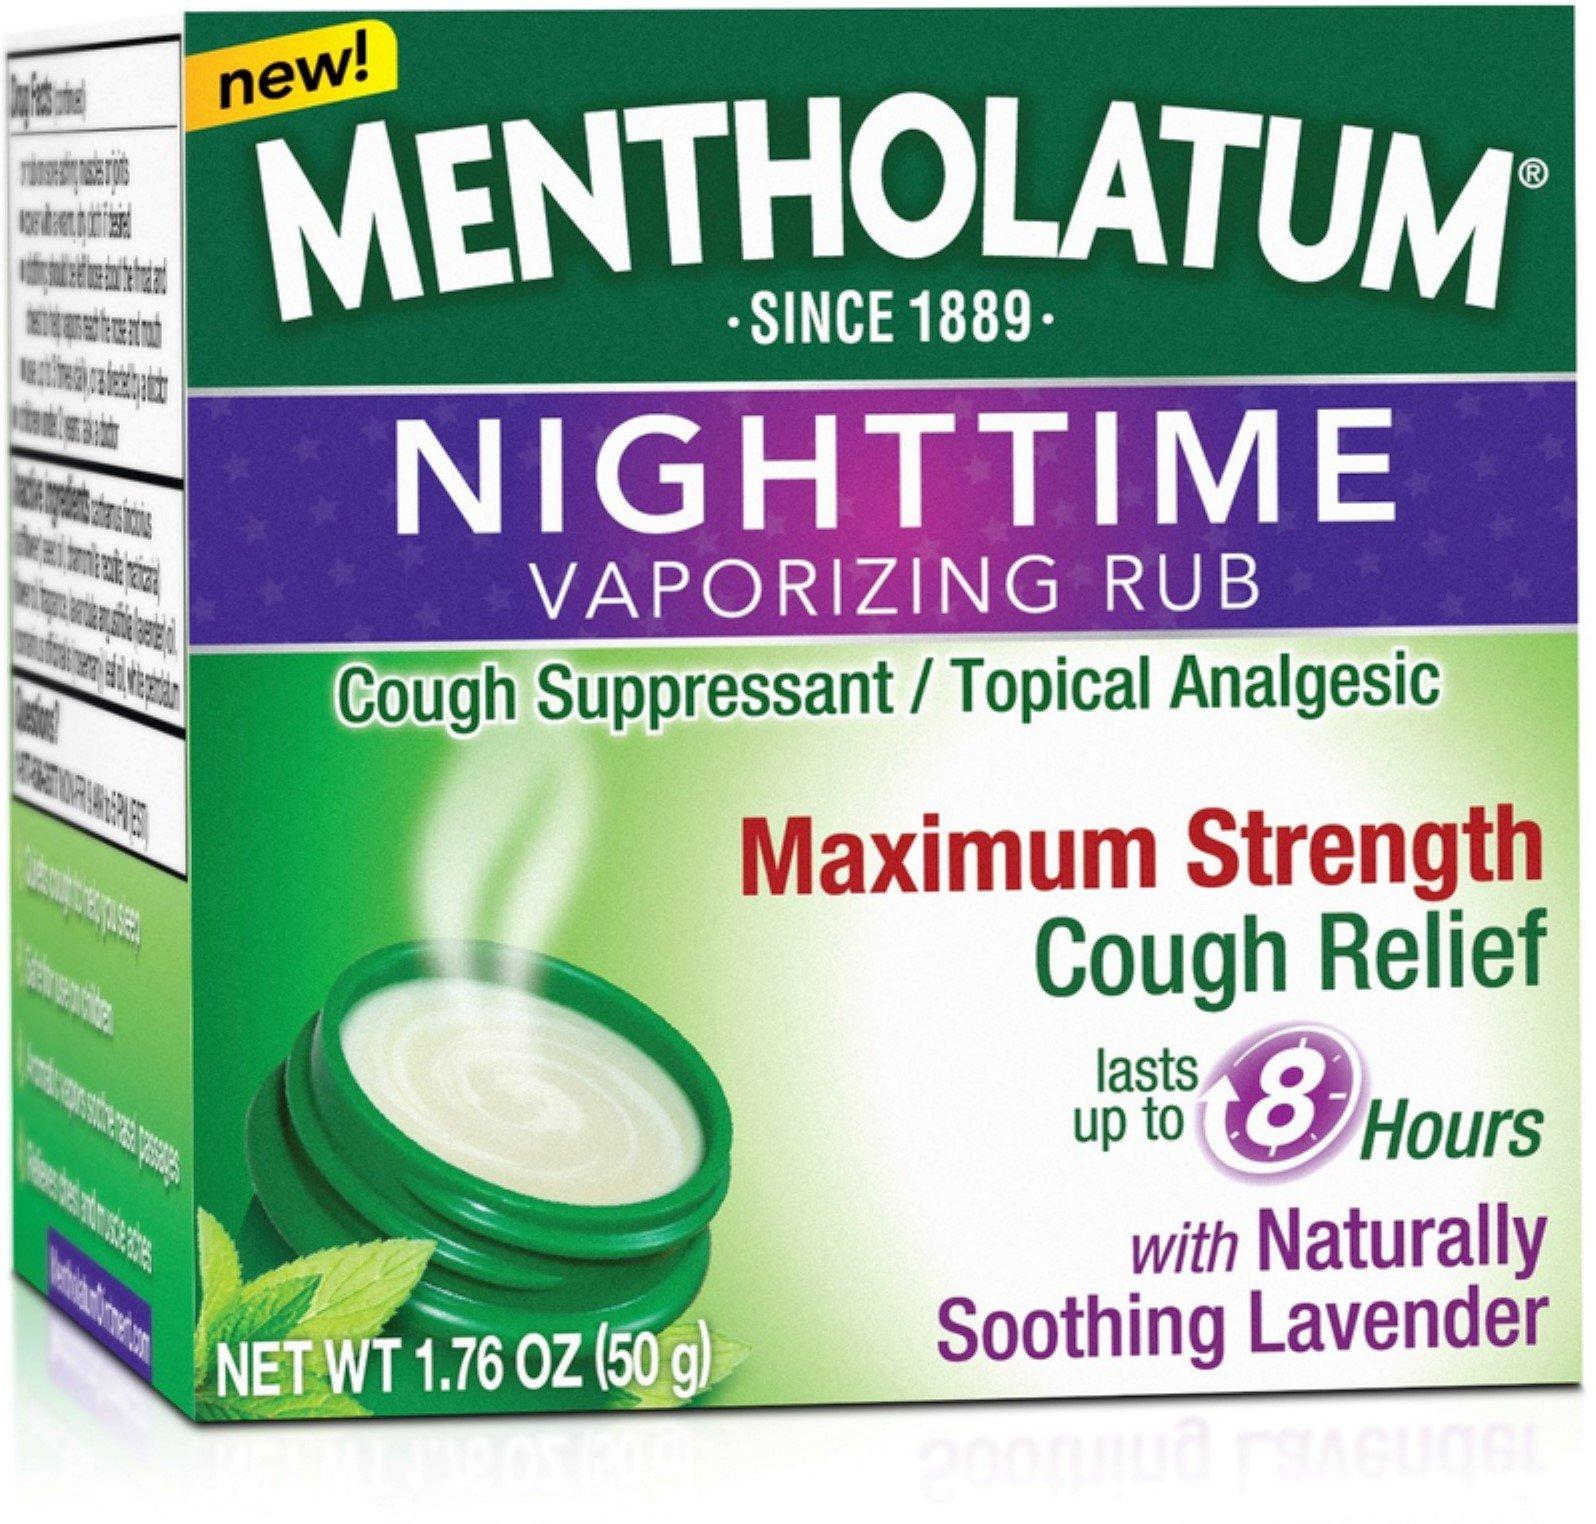 Mentholatum Night Vapor R Size 1.76z Mentholatum Night Vapor Rub 1.76z by Mentholatum